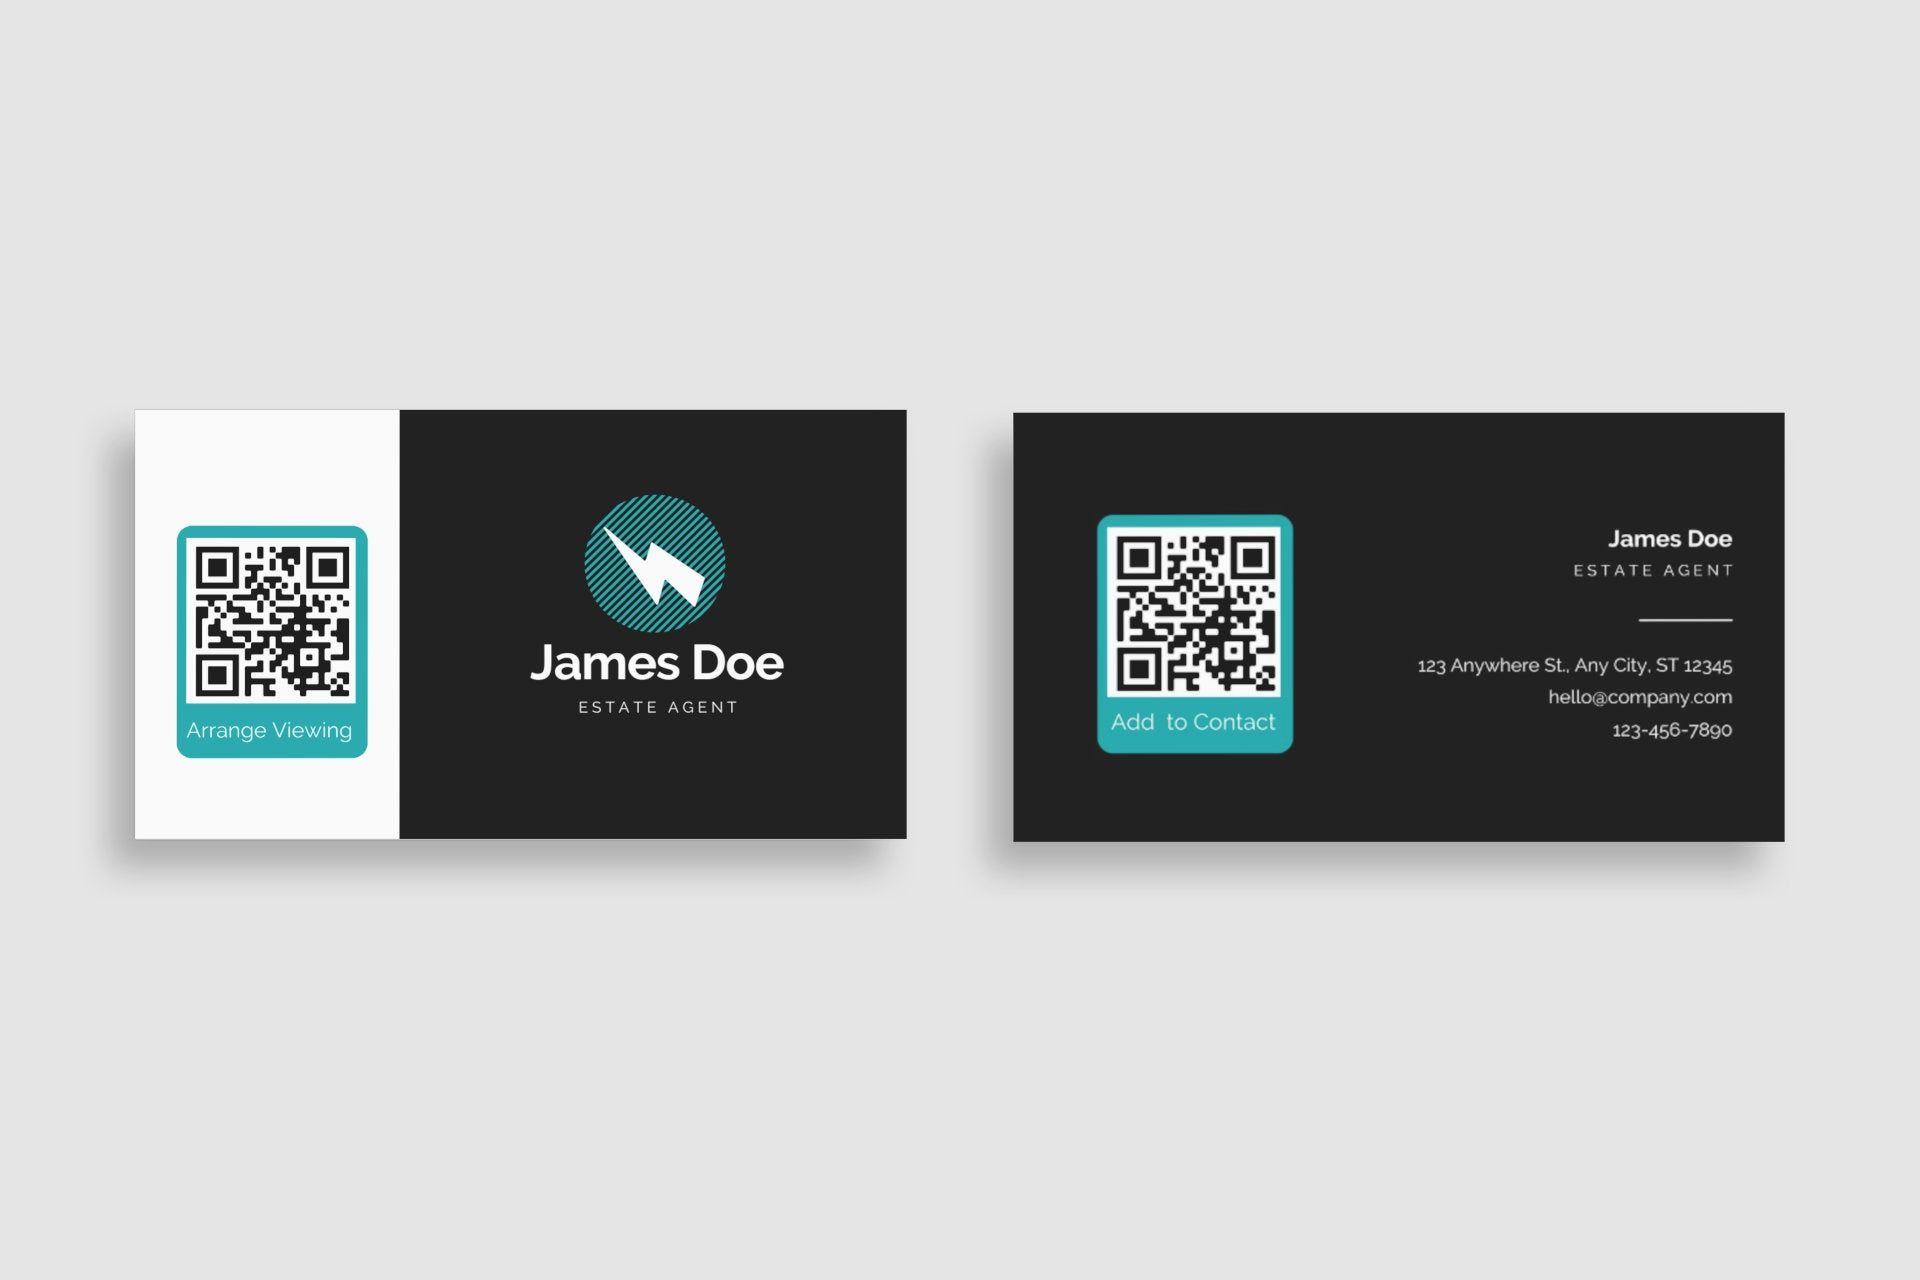 Qr Business Carddynamic Qr A Smart Chip Business Qr Code Etsy Digital Business Card Qr Code Business Card Create Business Cards